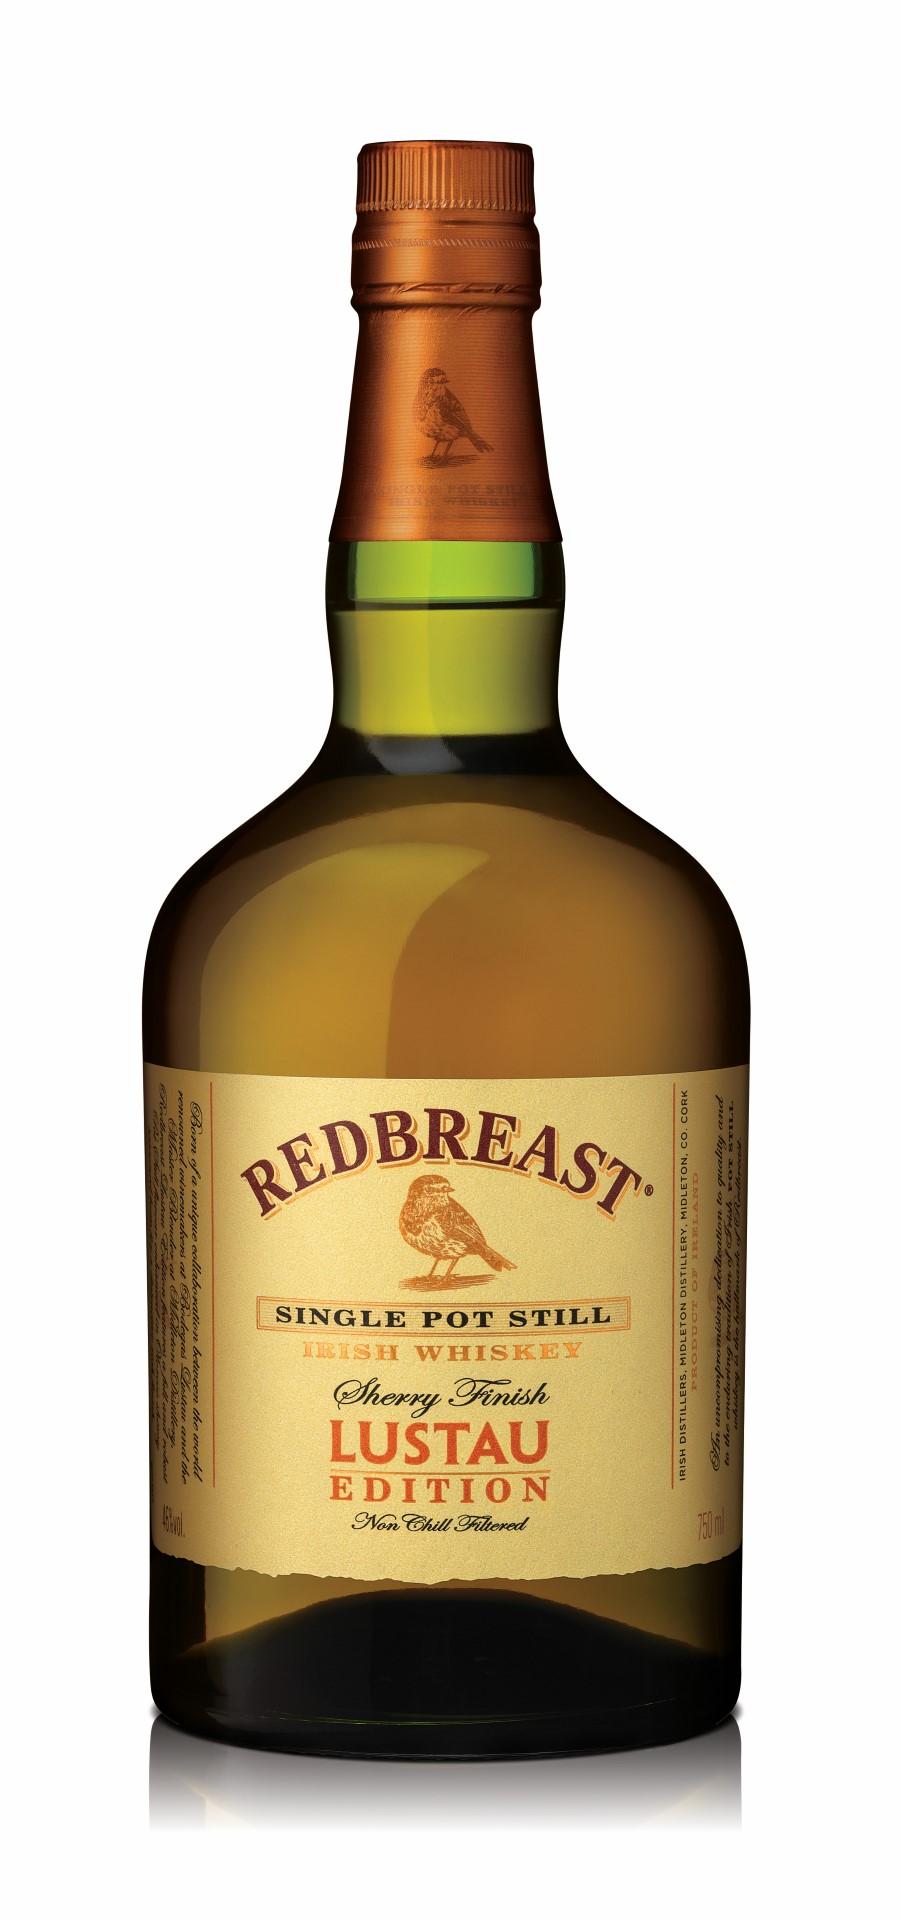 Redbreast Sherry Finish Lustau Edition Irish Whiskey